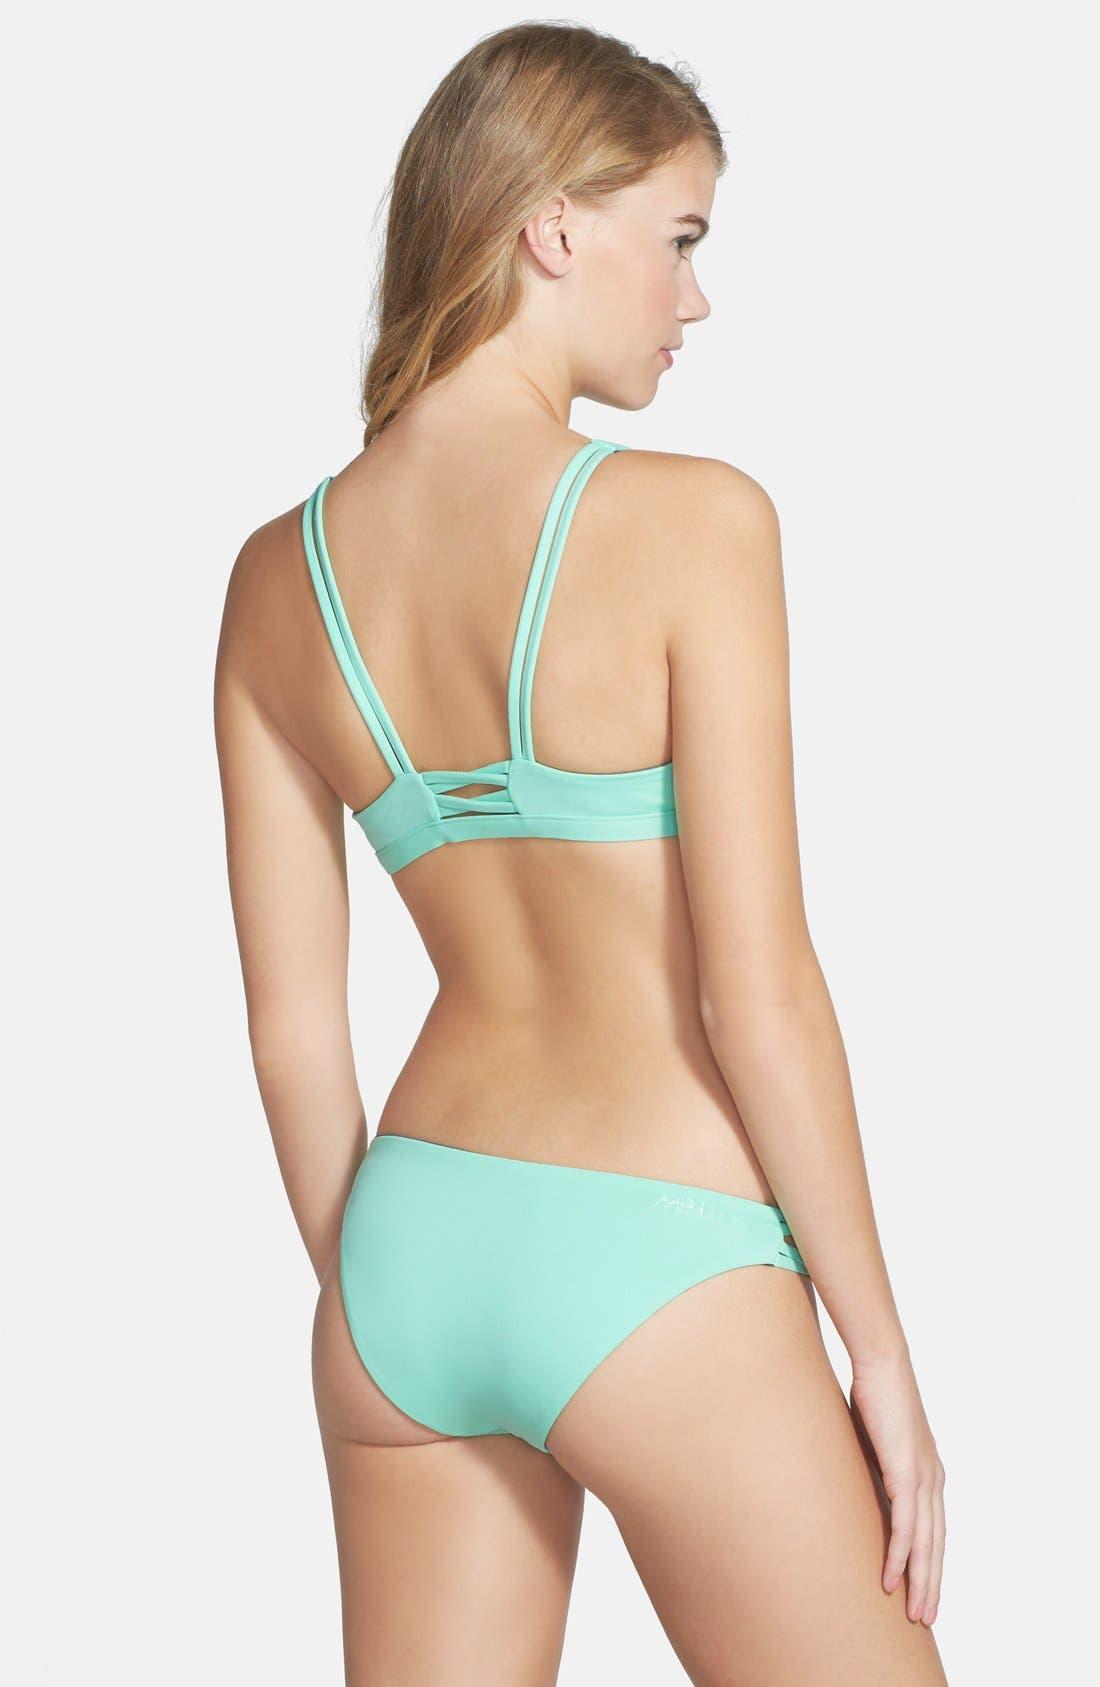 RIP CURL, 'Mirage' Reversible Bikini Top, Alternate thumbnail 3, color, 300